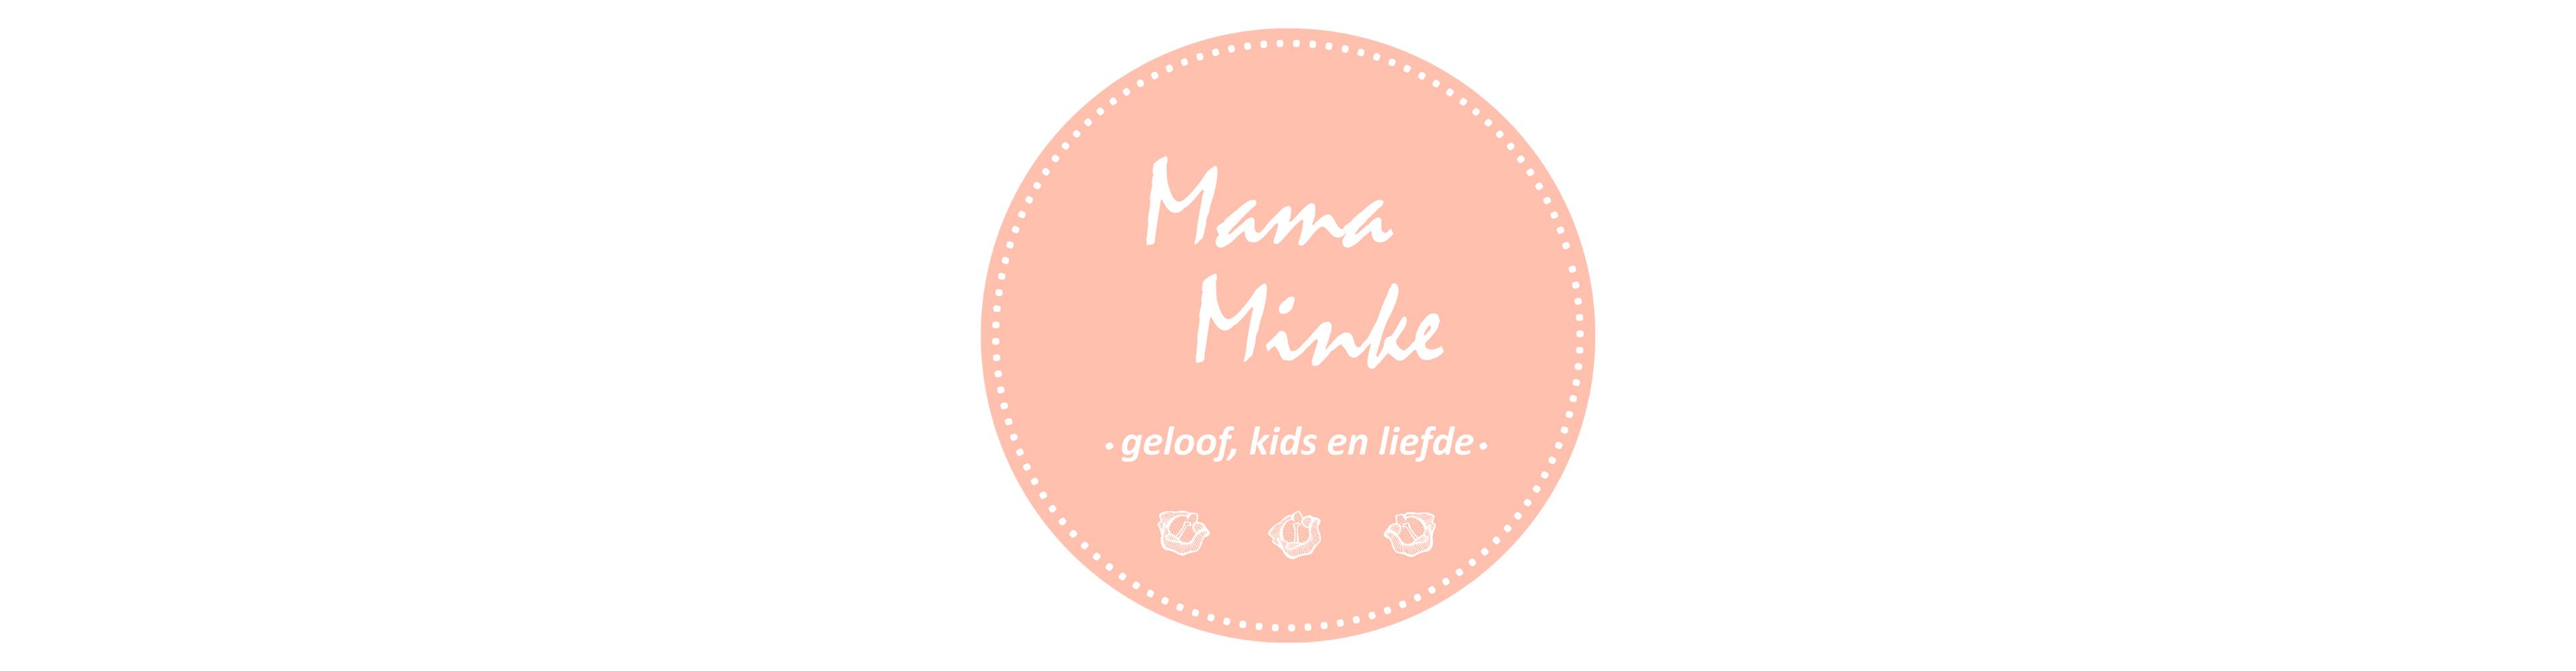 MamaMinke